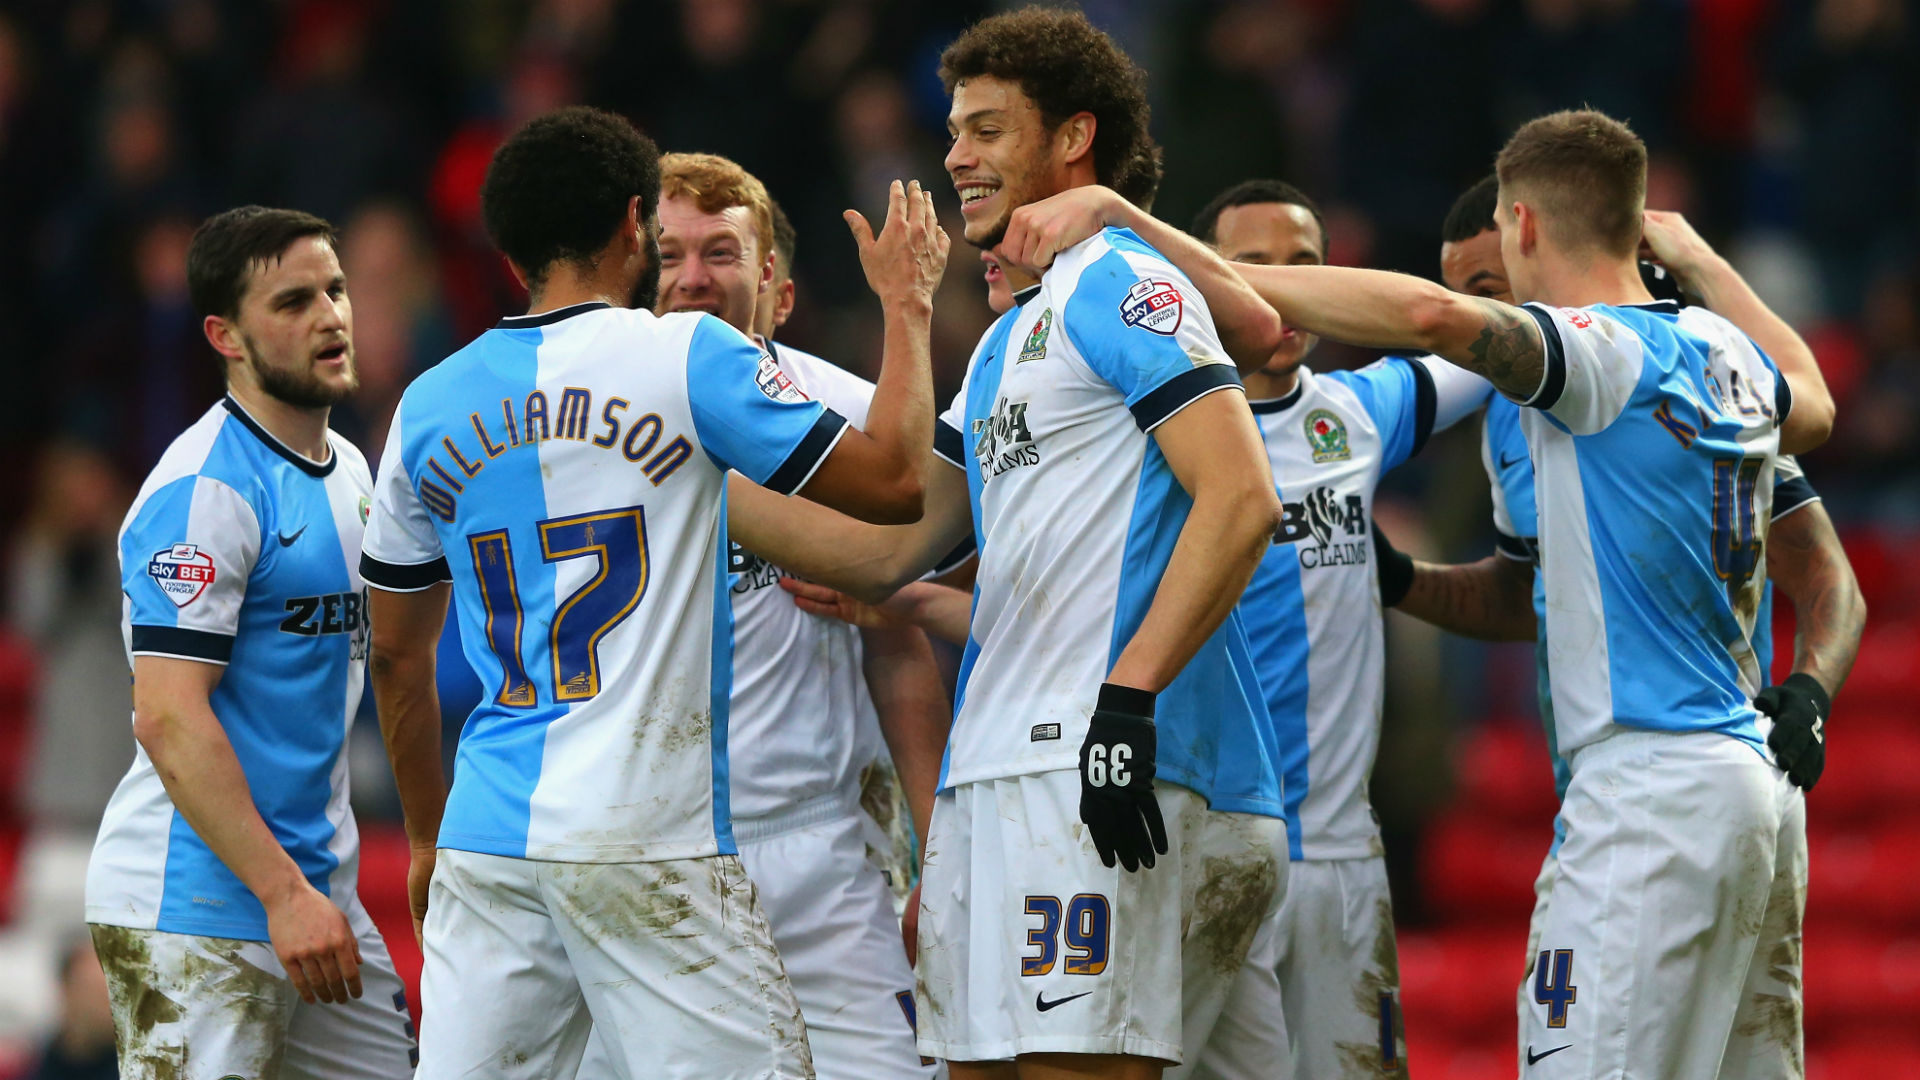 Kahoots gentlemens club Portsmouth